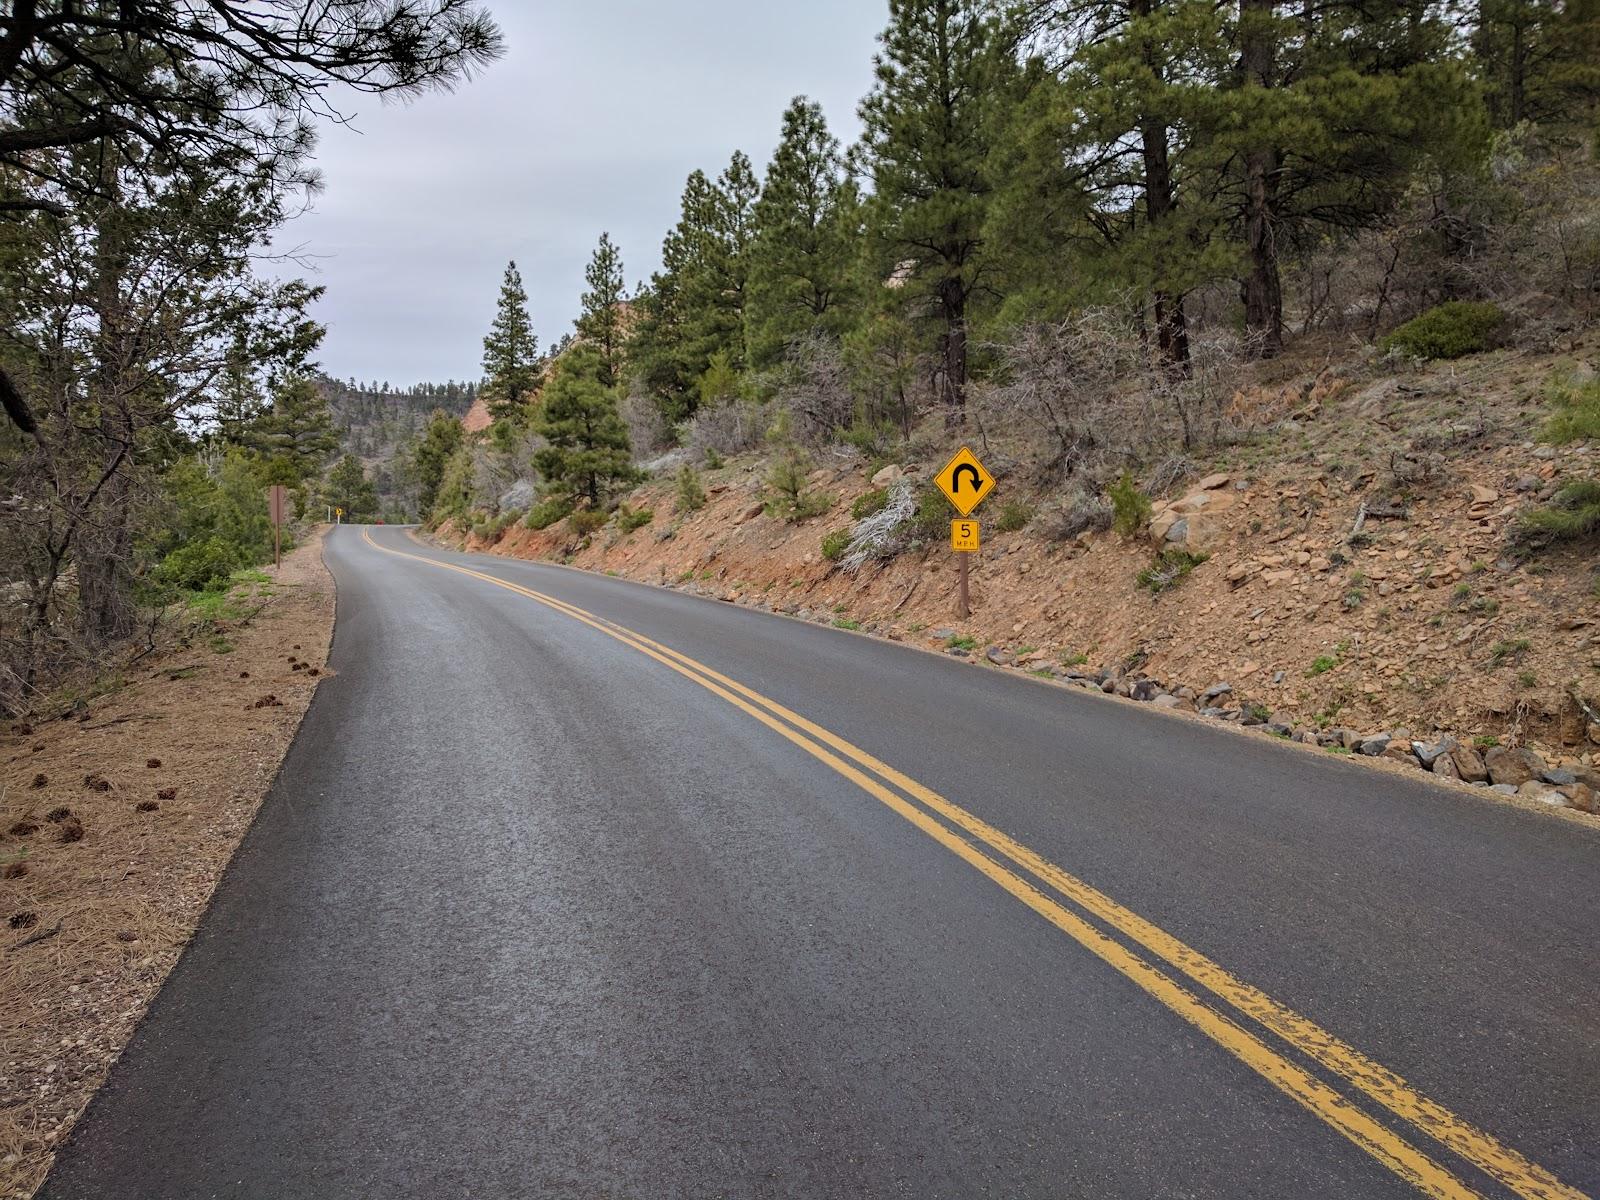 Kolob Terrace bike climb - finish - roadway and forest